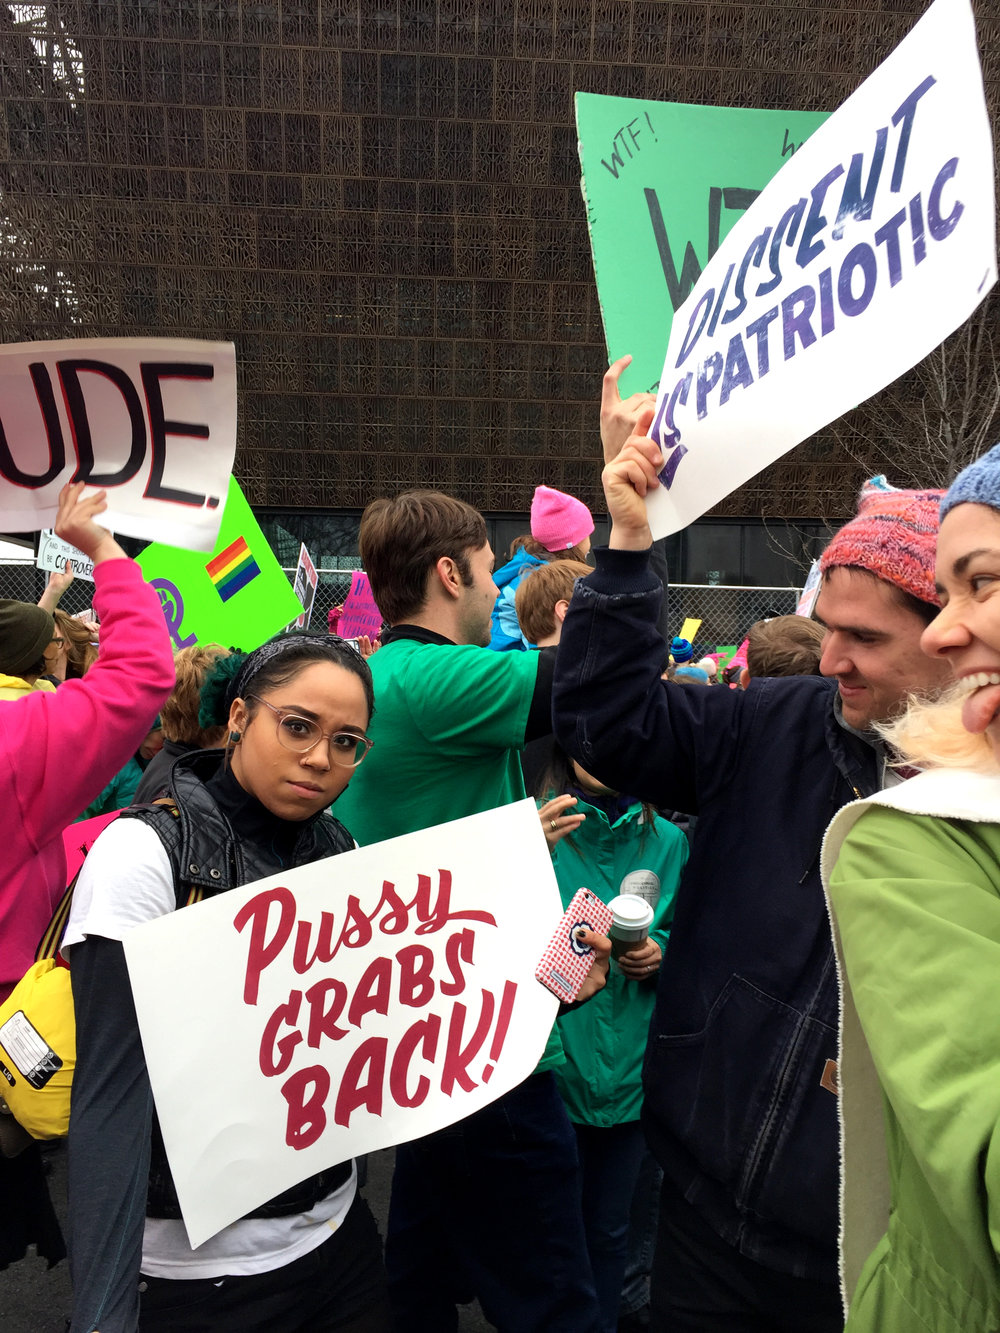 protest_pics2.jpg